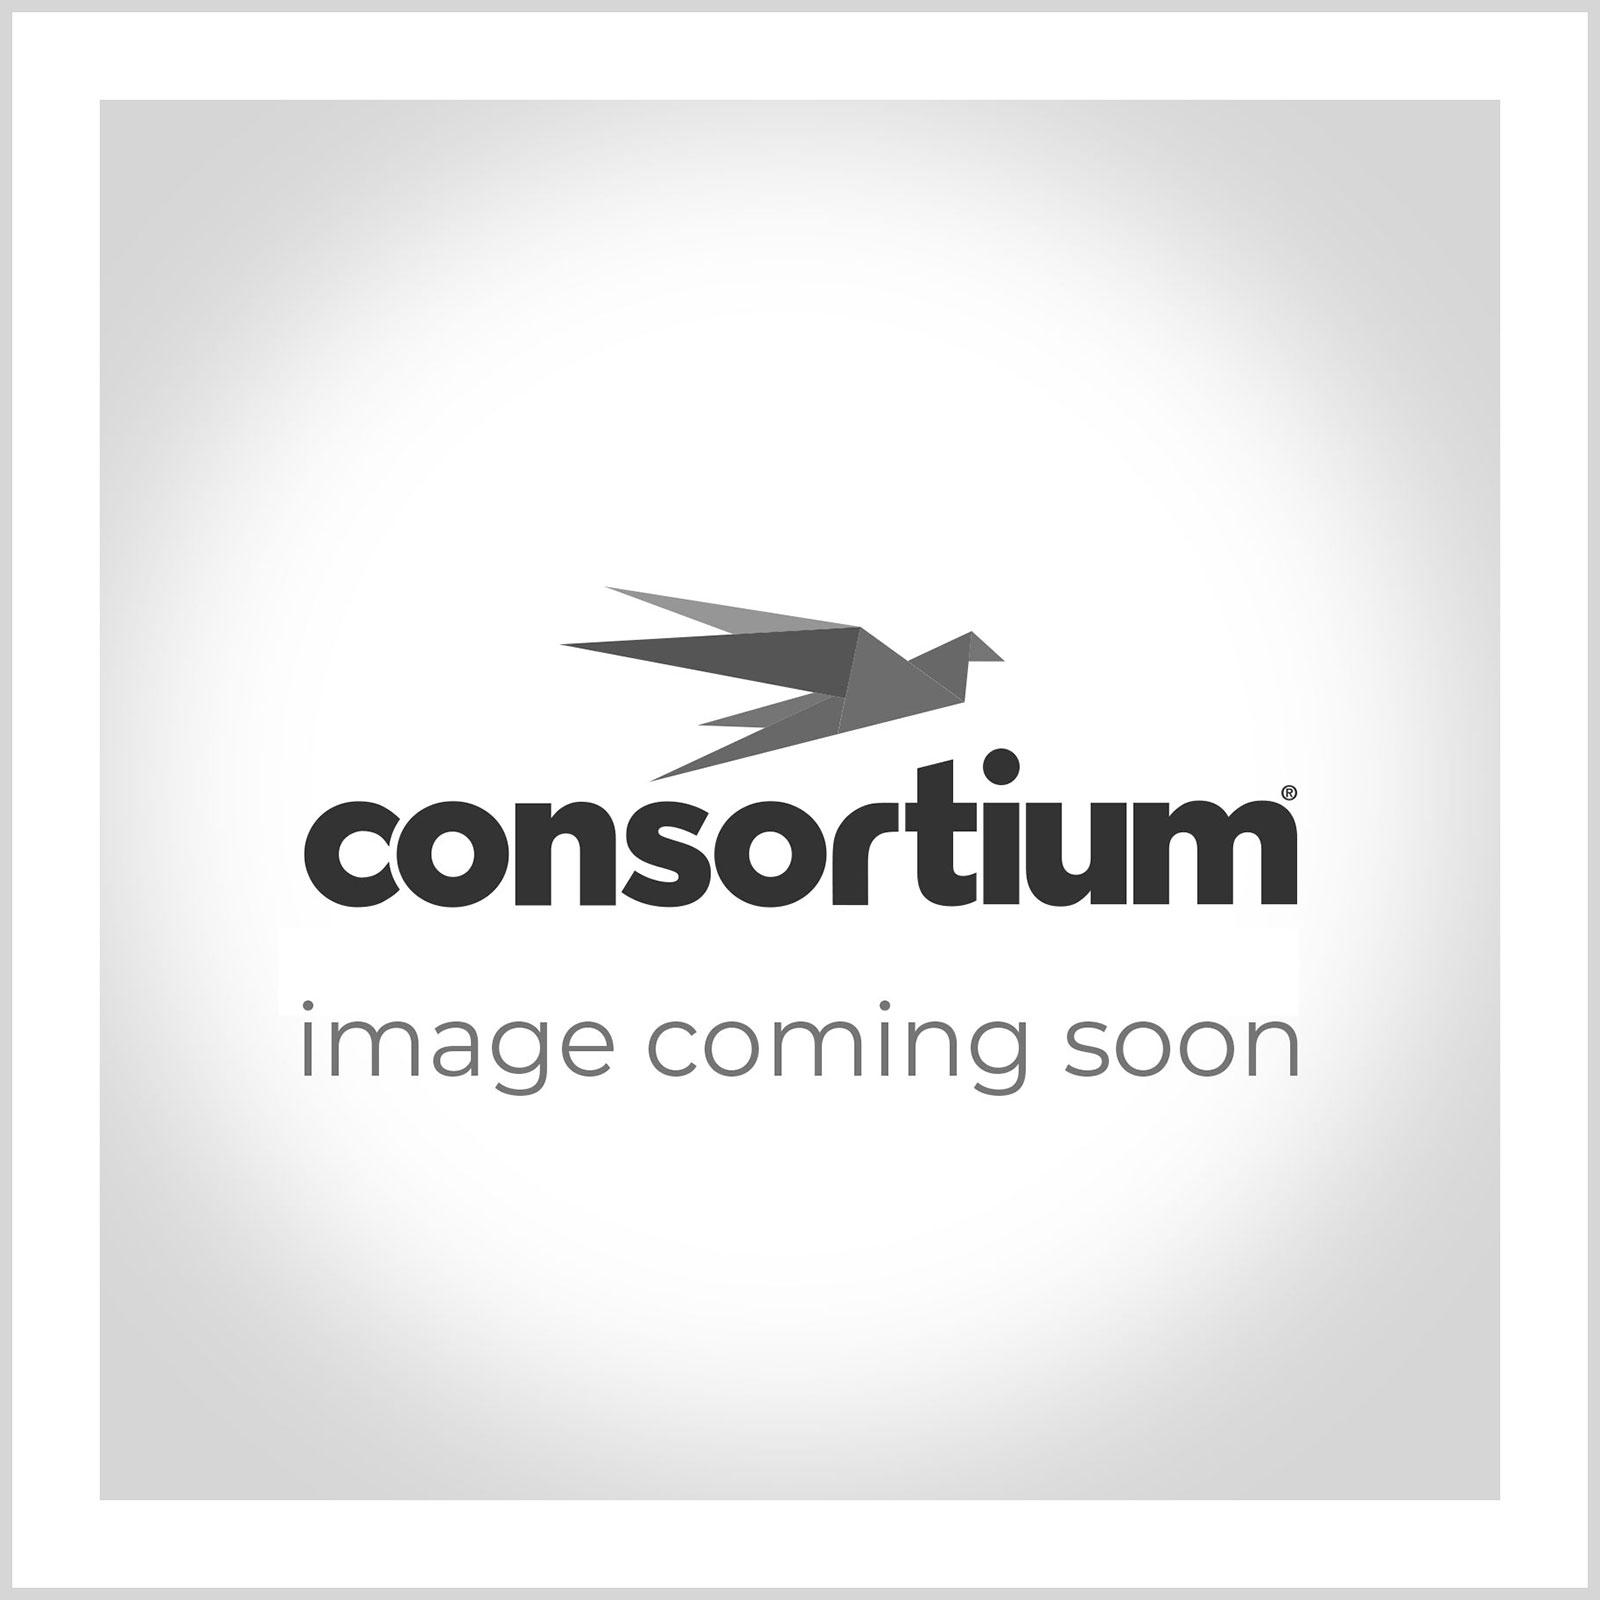 Consortium Polypropylene Covering Material Self-Adhesive